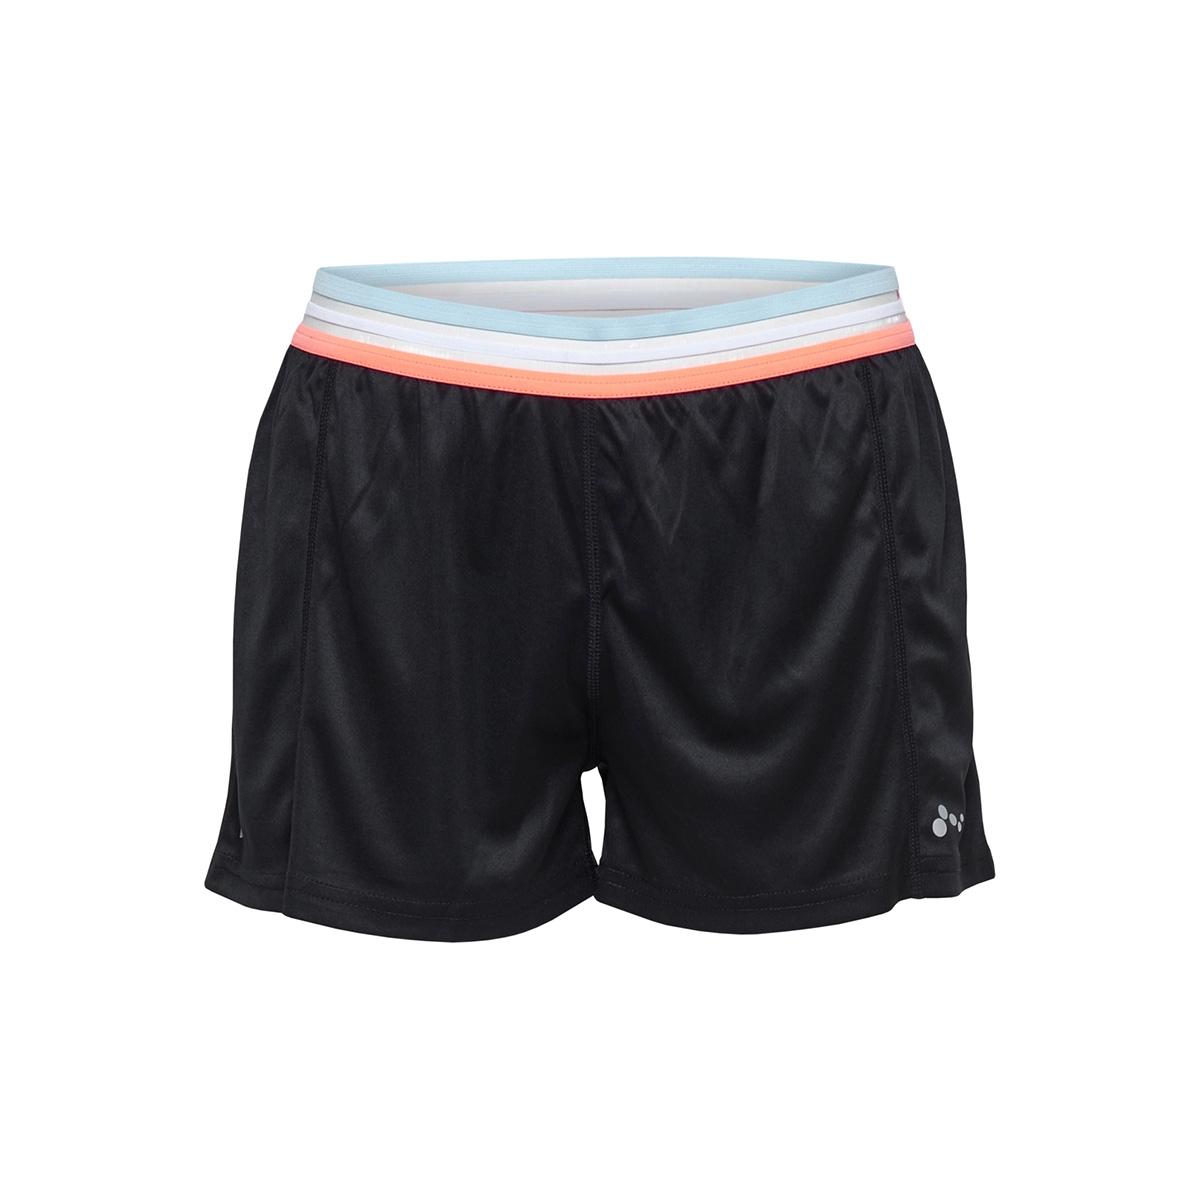 onpmirada training shorts 15165447 only play sport short black